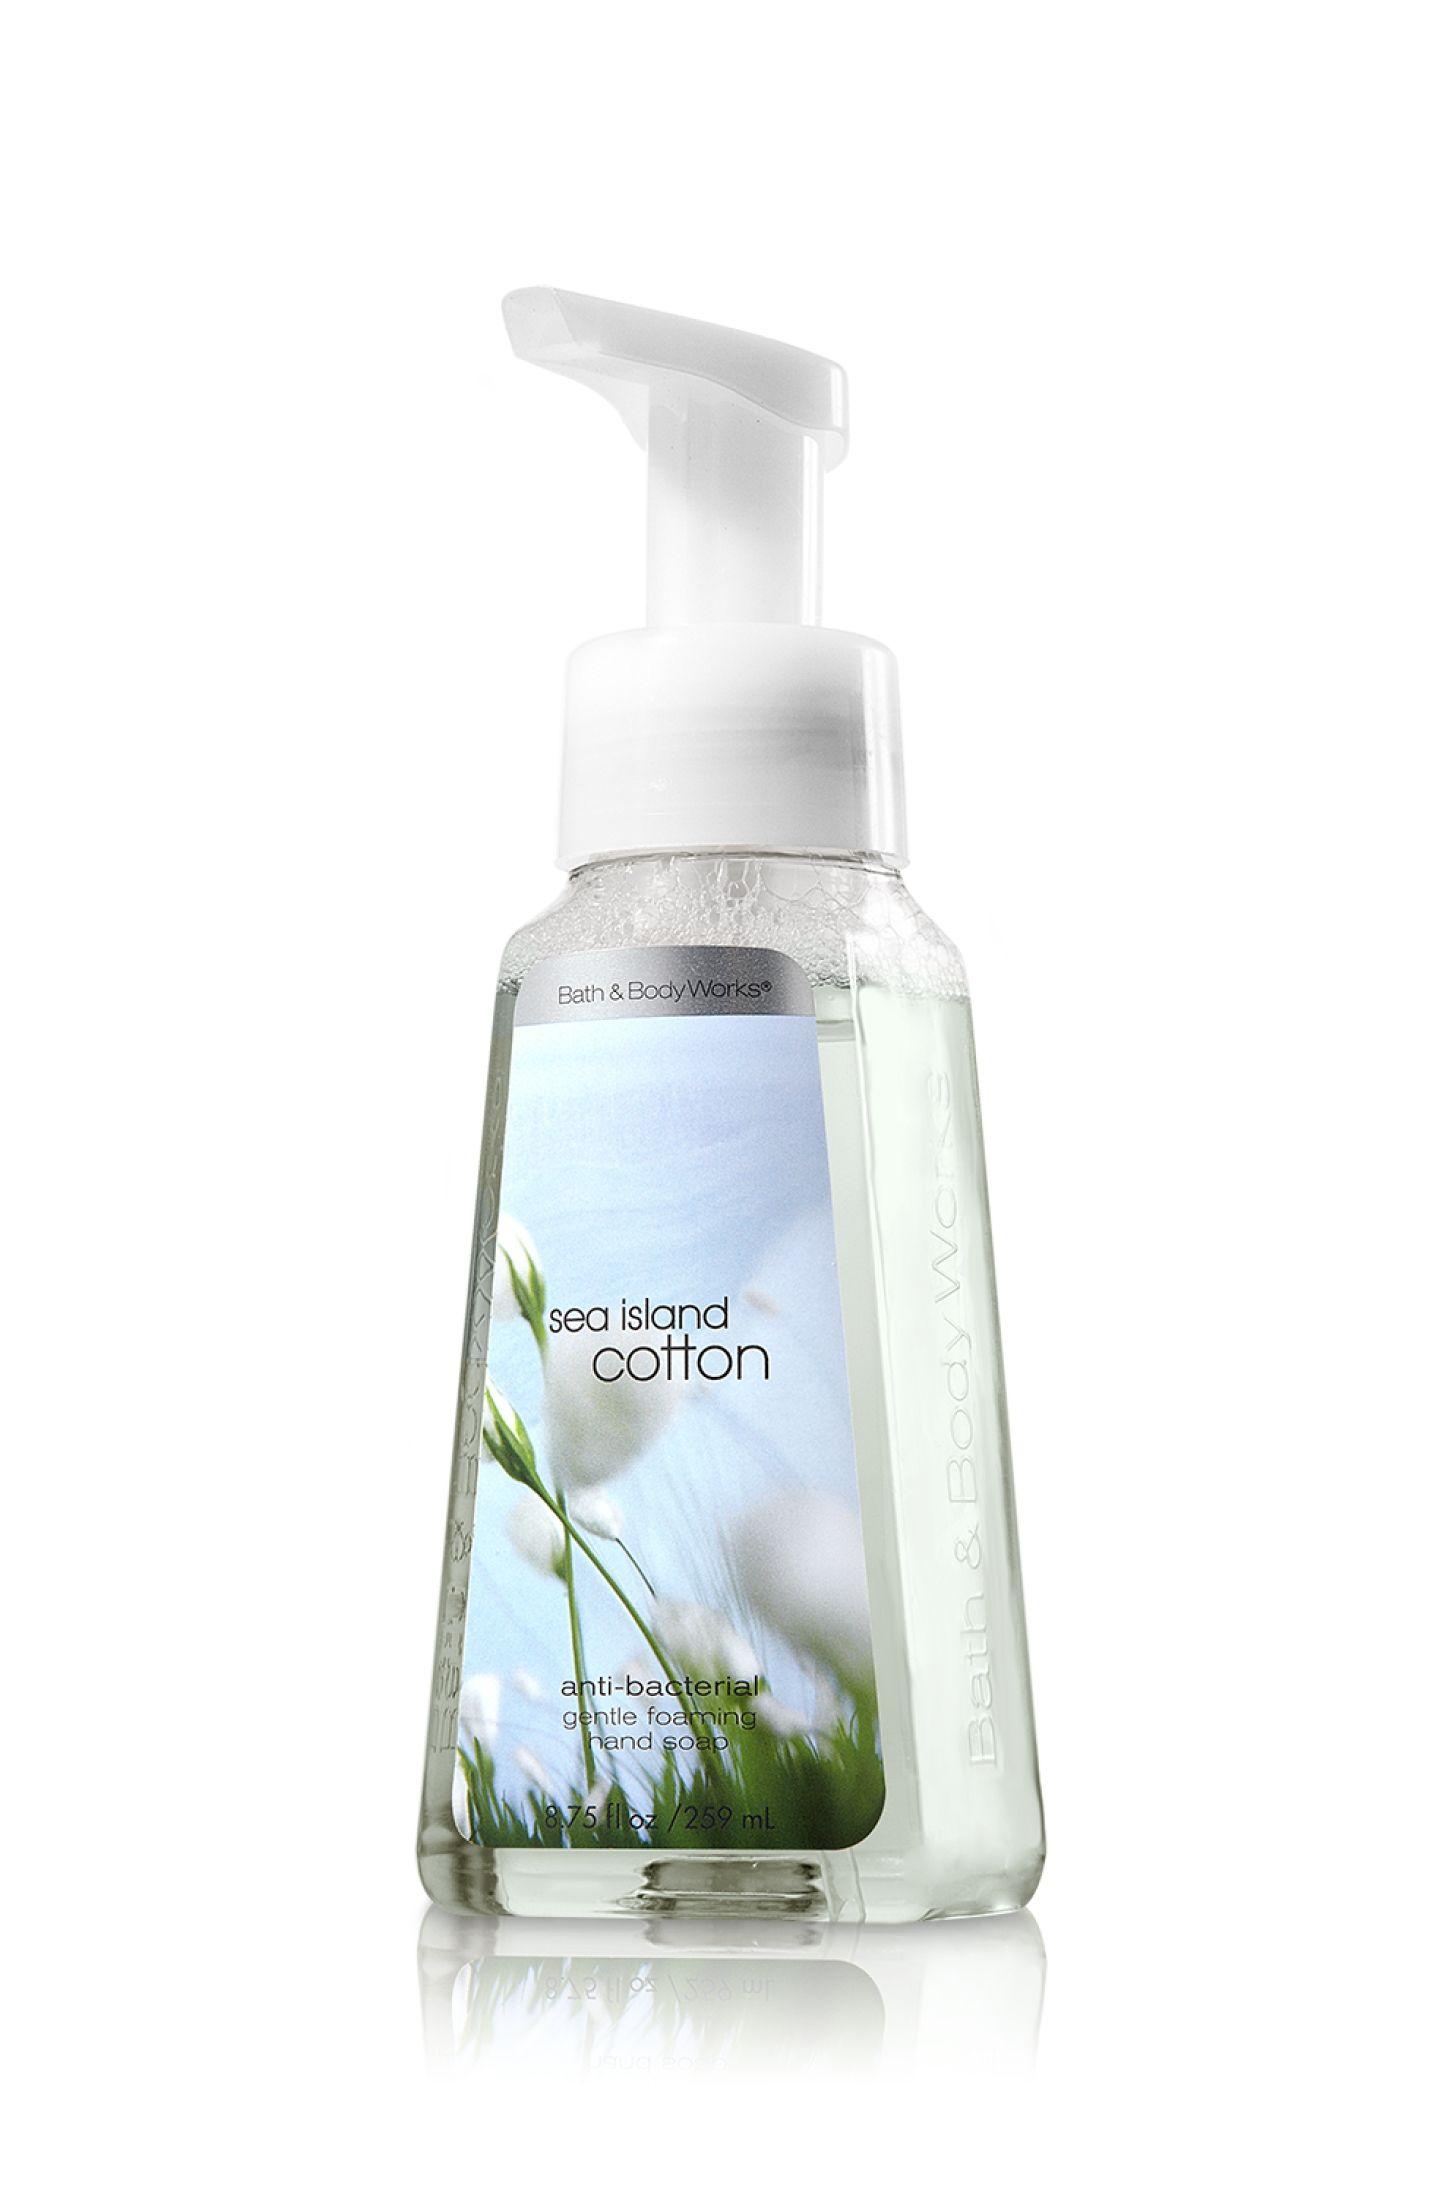 Sea Island Cotton Gentle Foaming Hand Soap By Bath Body Works